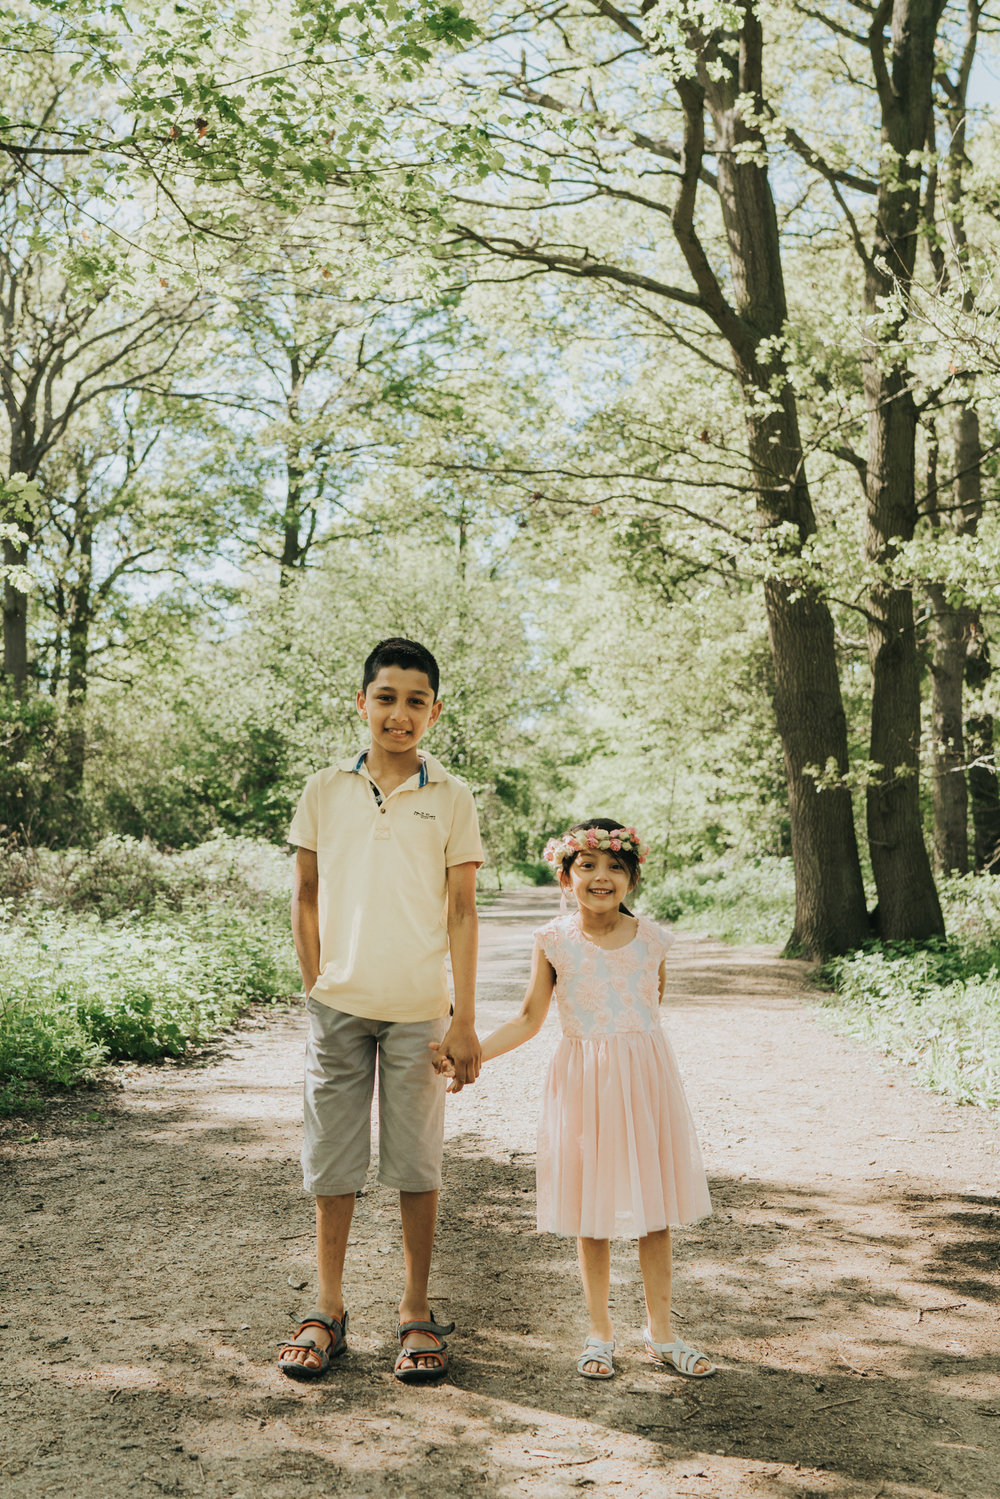 Chandrasiri-Family-Session-Woodland-Colchester-Essex-Grace-Elizabeth-Alternative-Wedding-Photographer (1 of 1).jpg (16 of 34).jpg